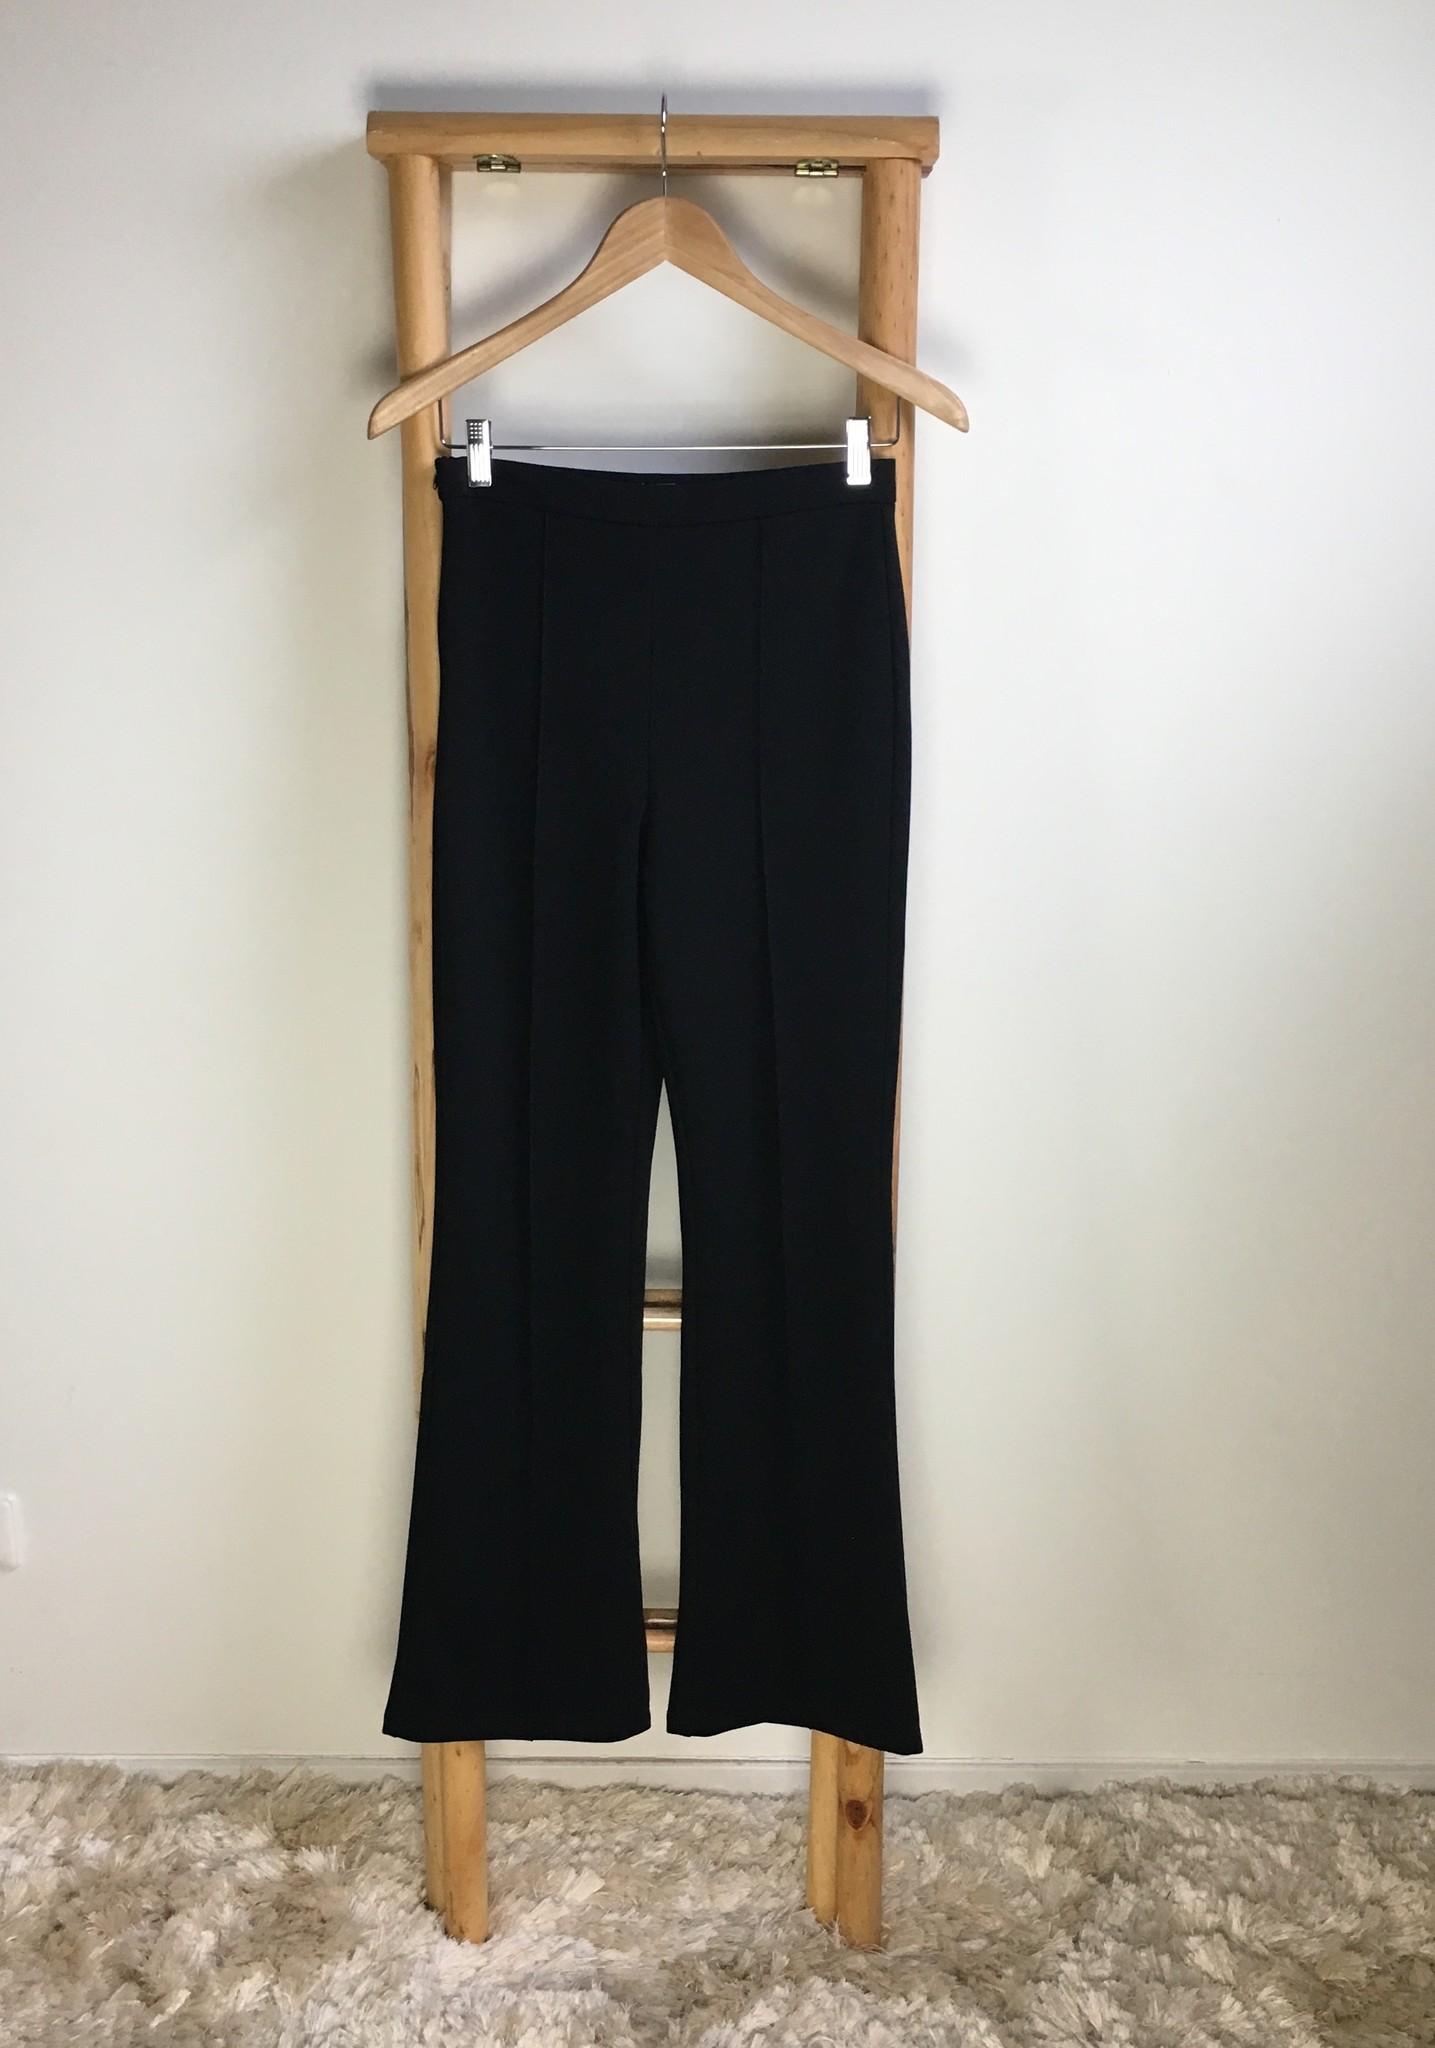 Flarred pants gallipoli d-bruin